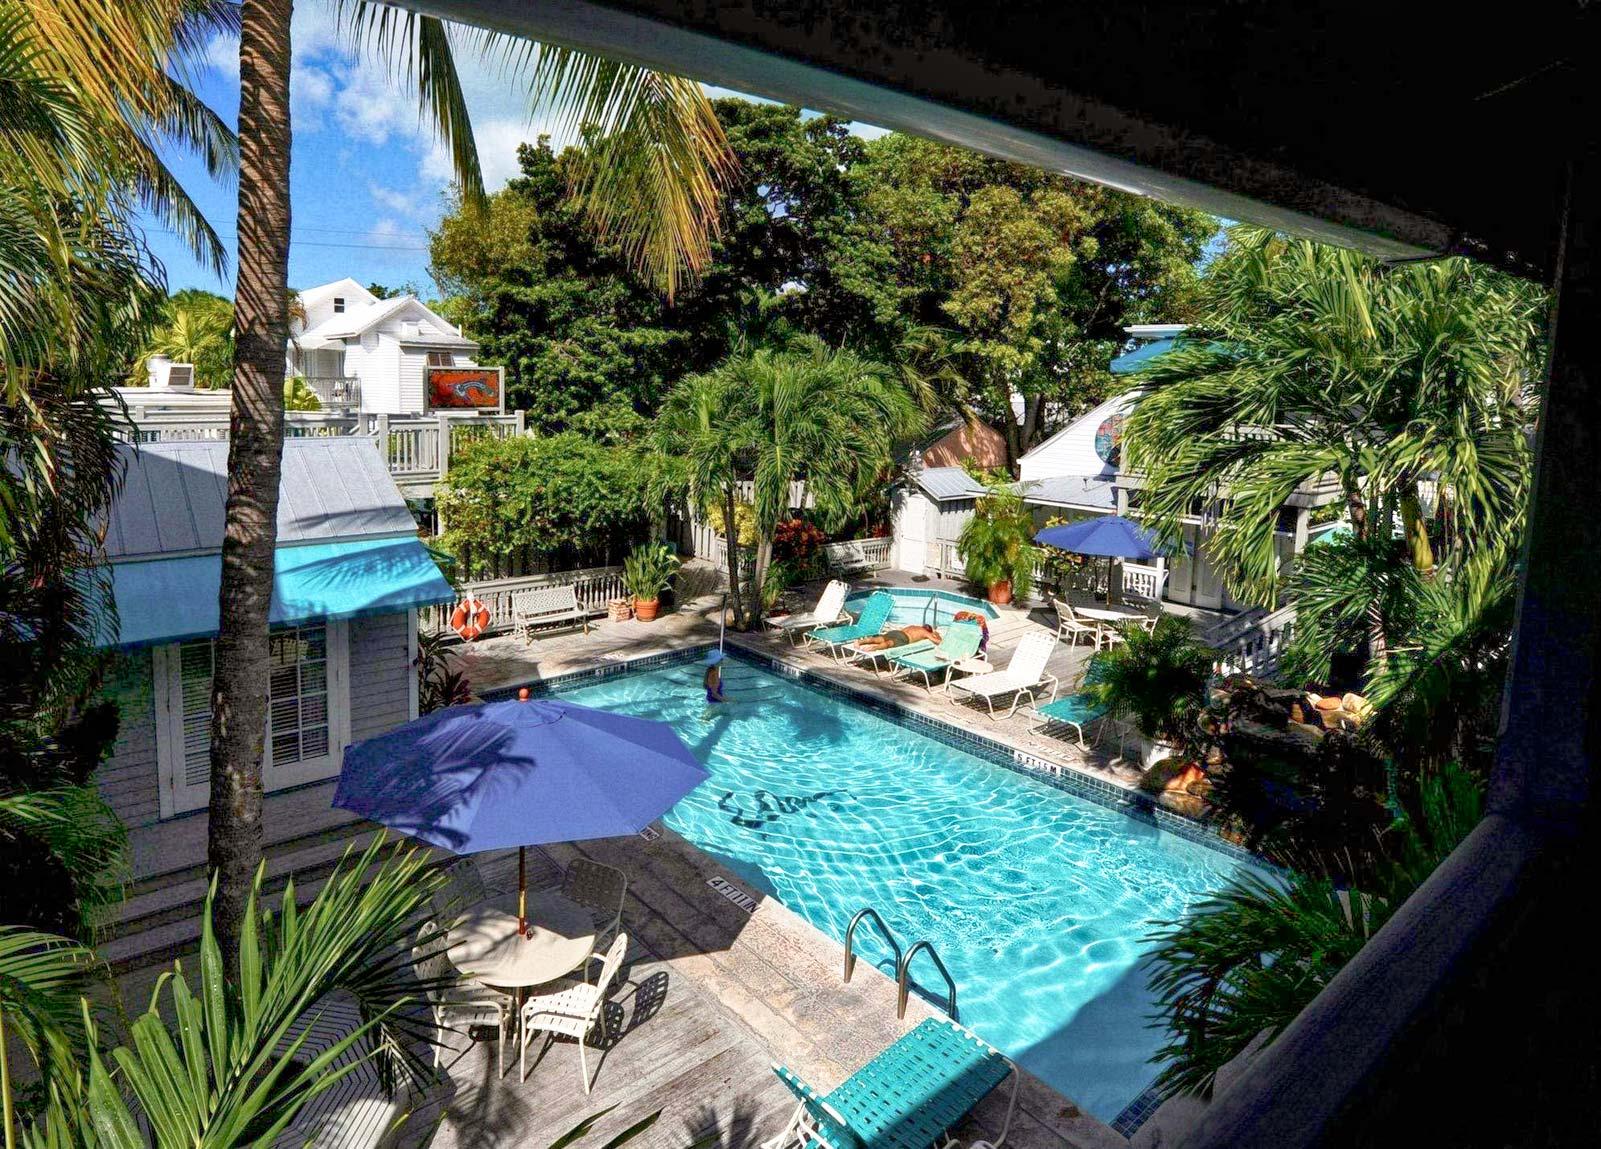 Eden House Key West  Eden House Hotel